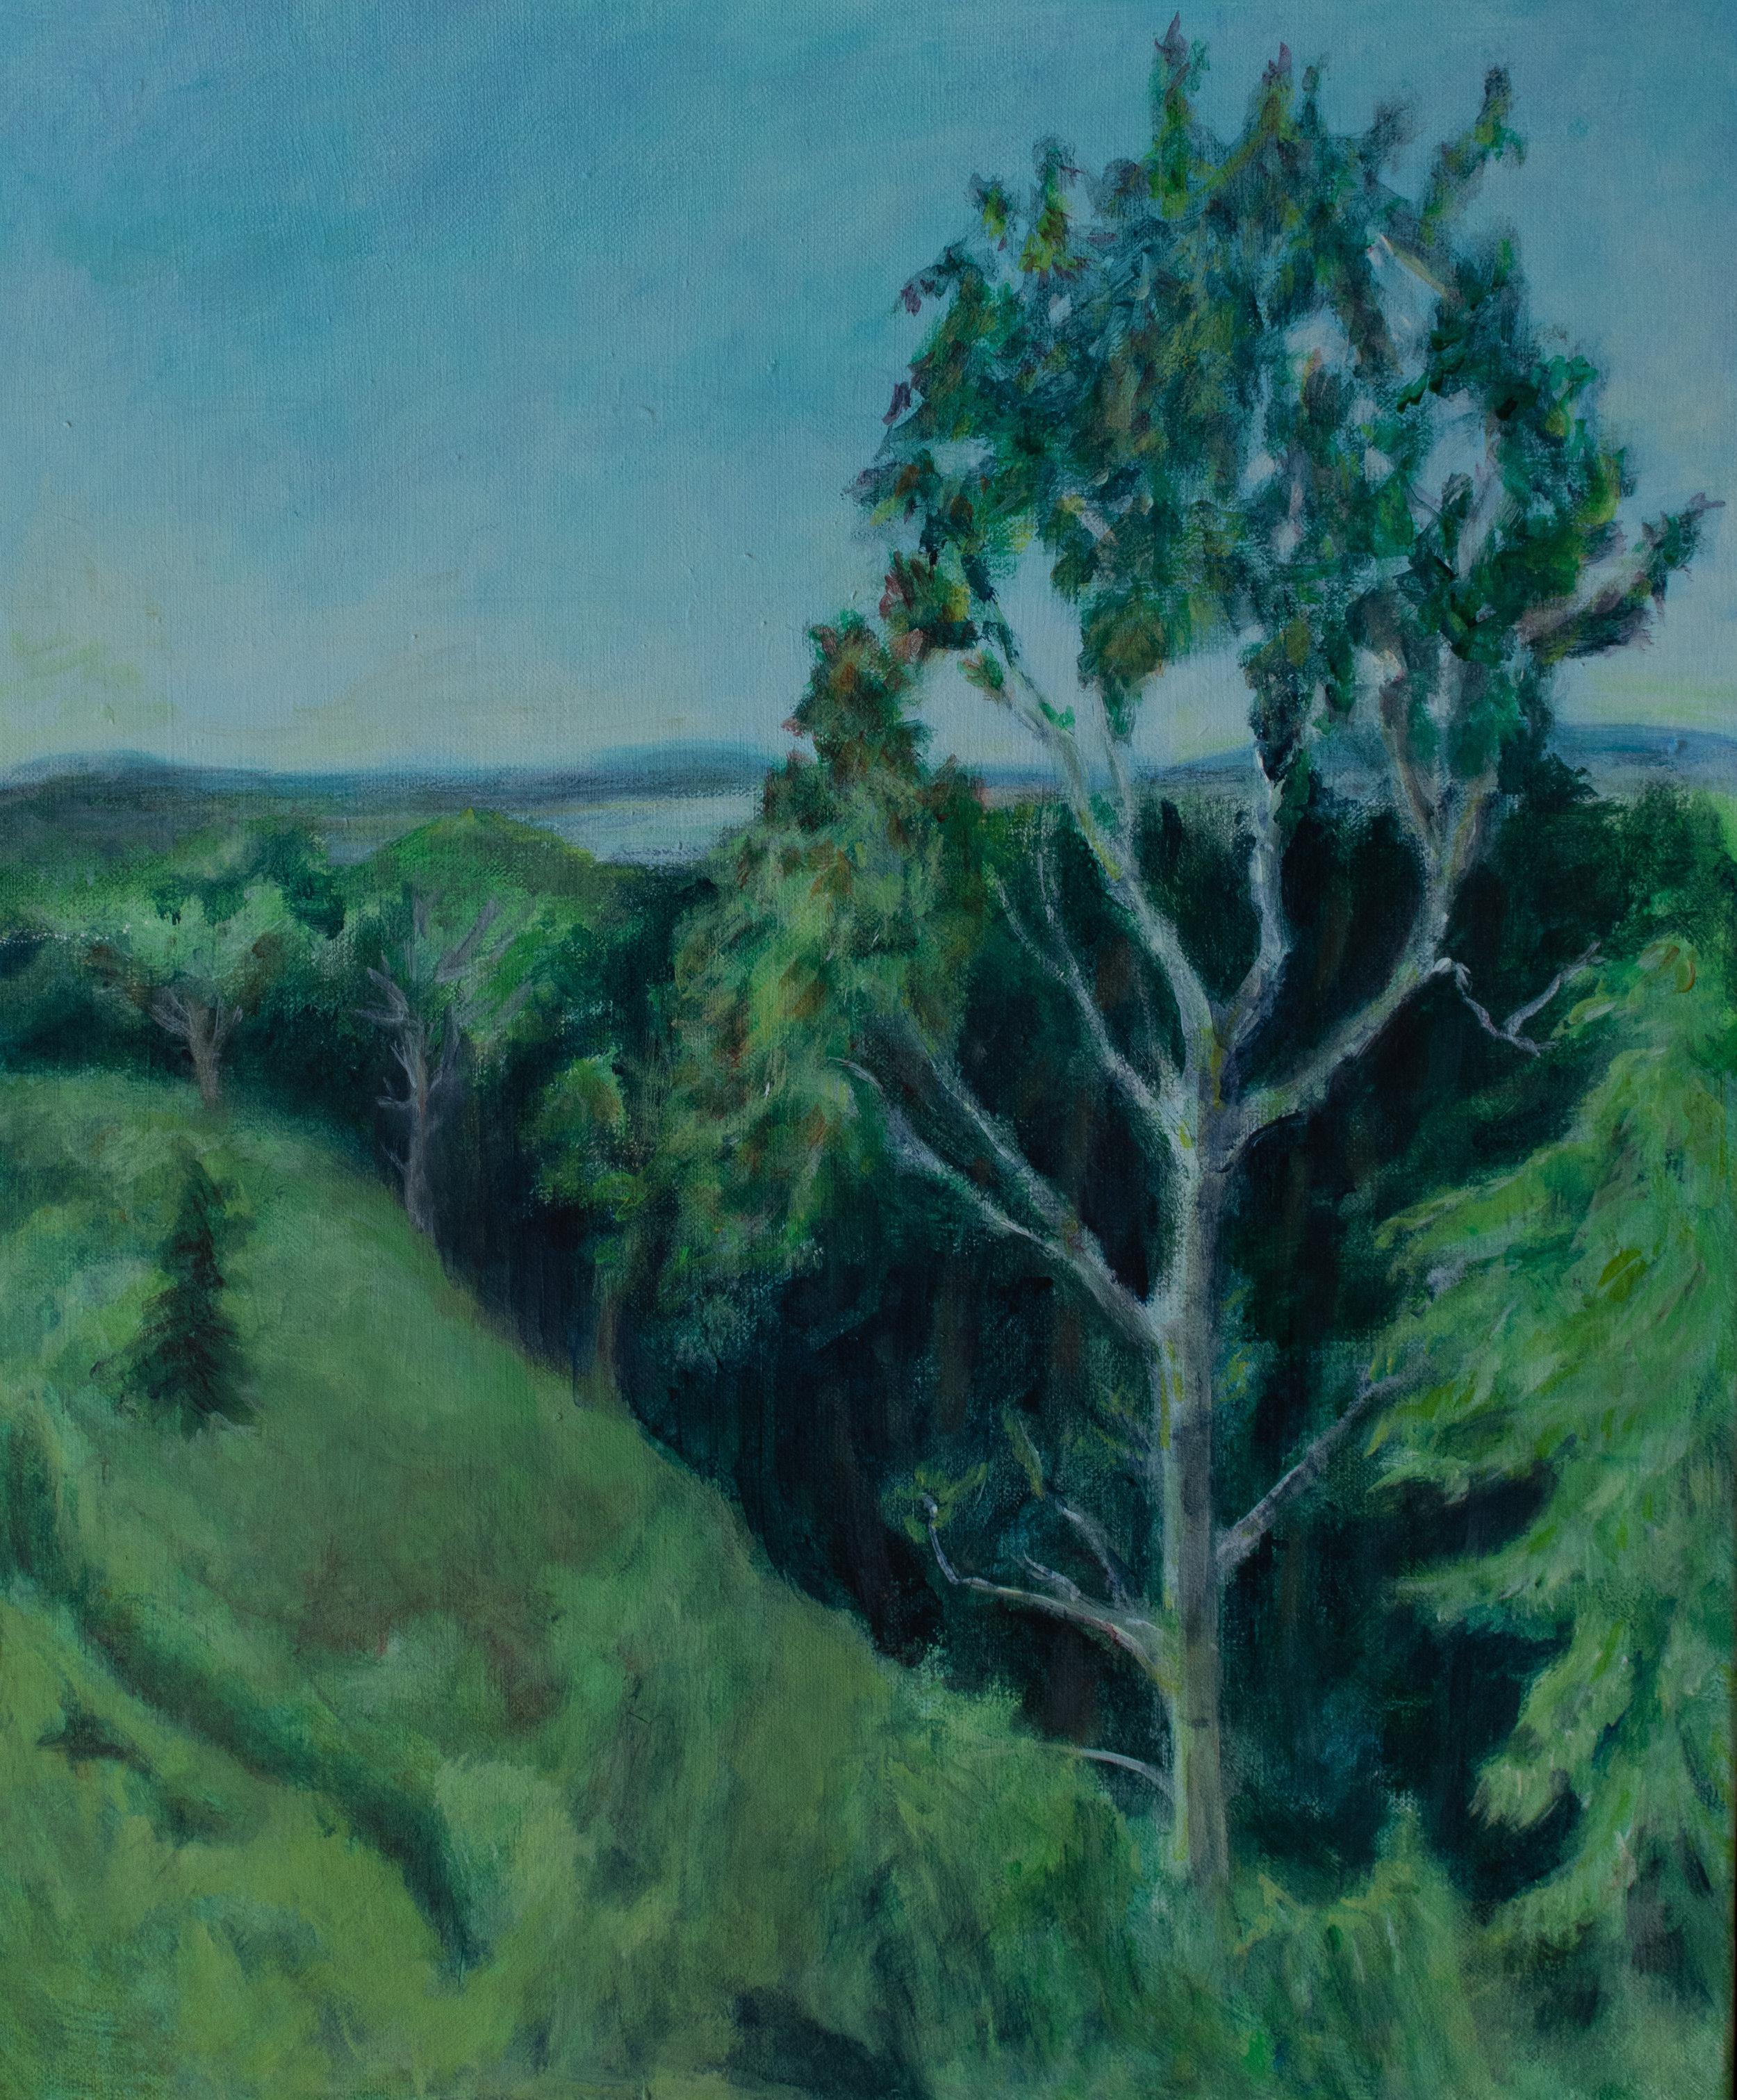 "Catskill Ravine and Hudson River, 30"" x 24"", Acrylic on Canvas, Rachel Lulov Segall"